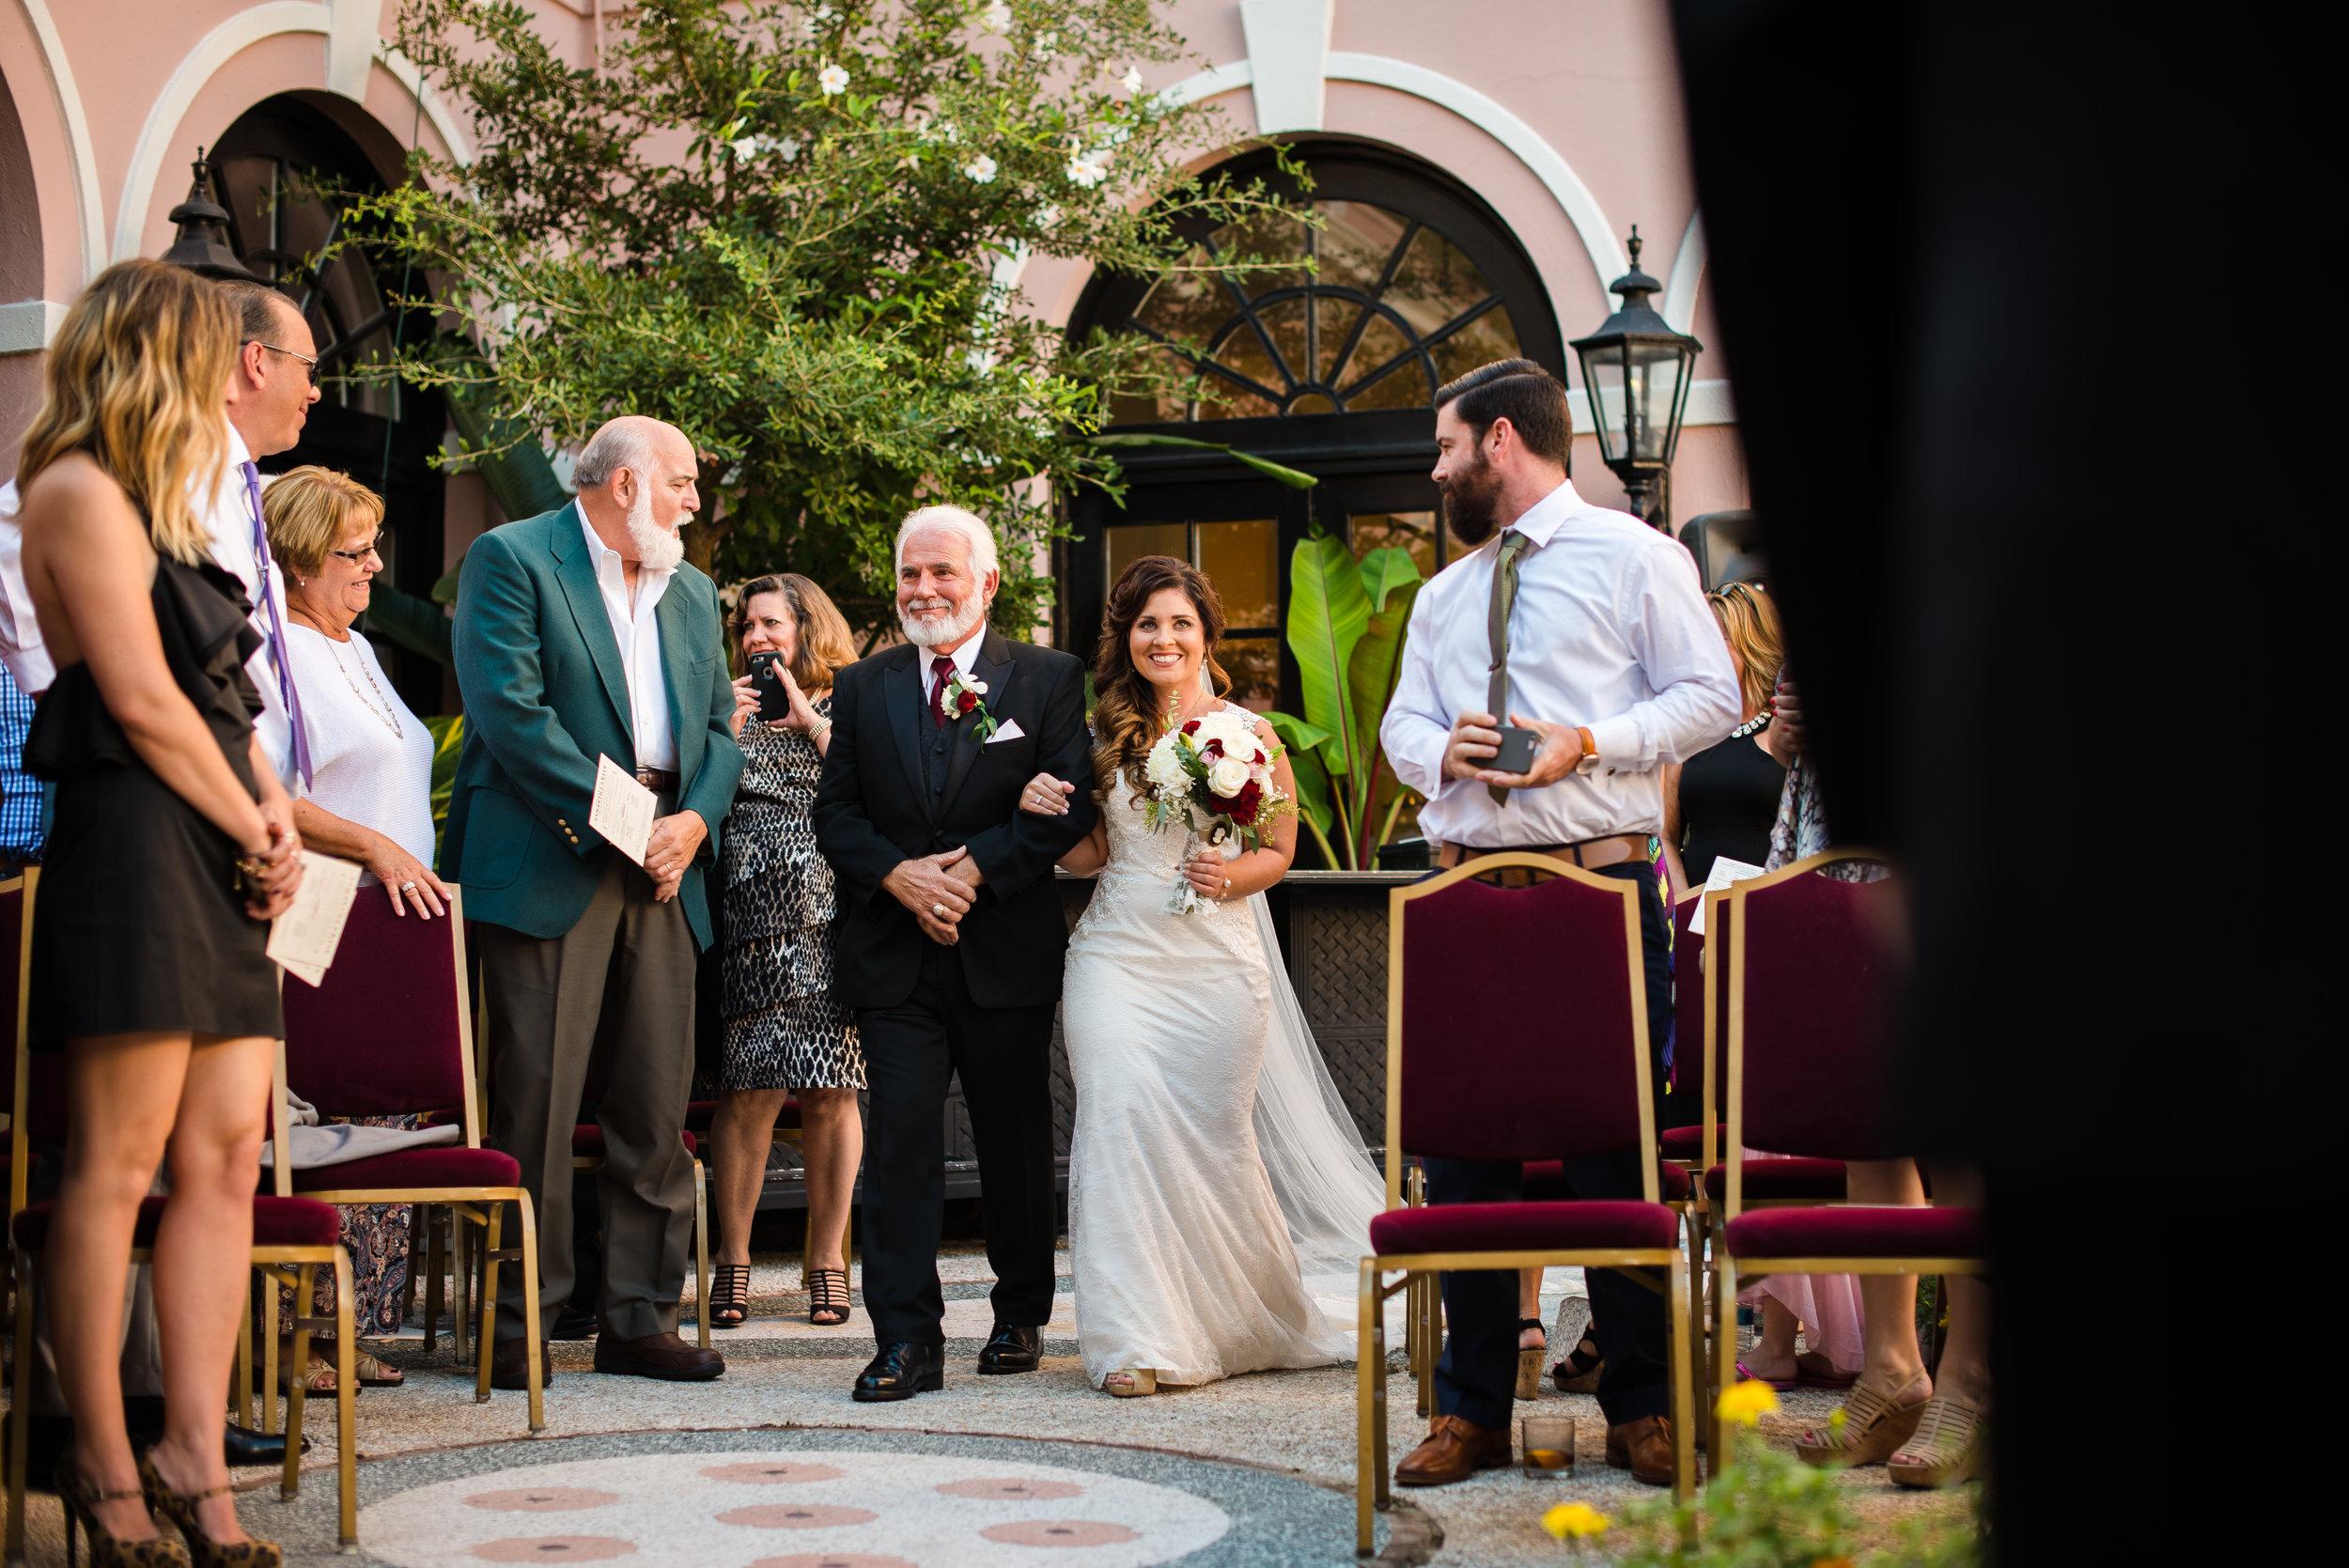 Historic_October_Charleston_Destination_Wedding_The_Mills_House_Father-walking-Bride-down-aisle_